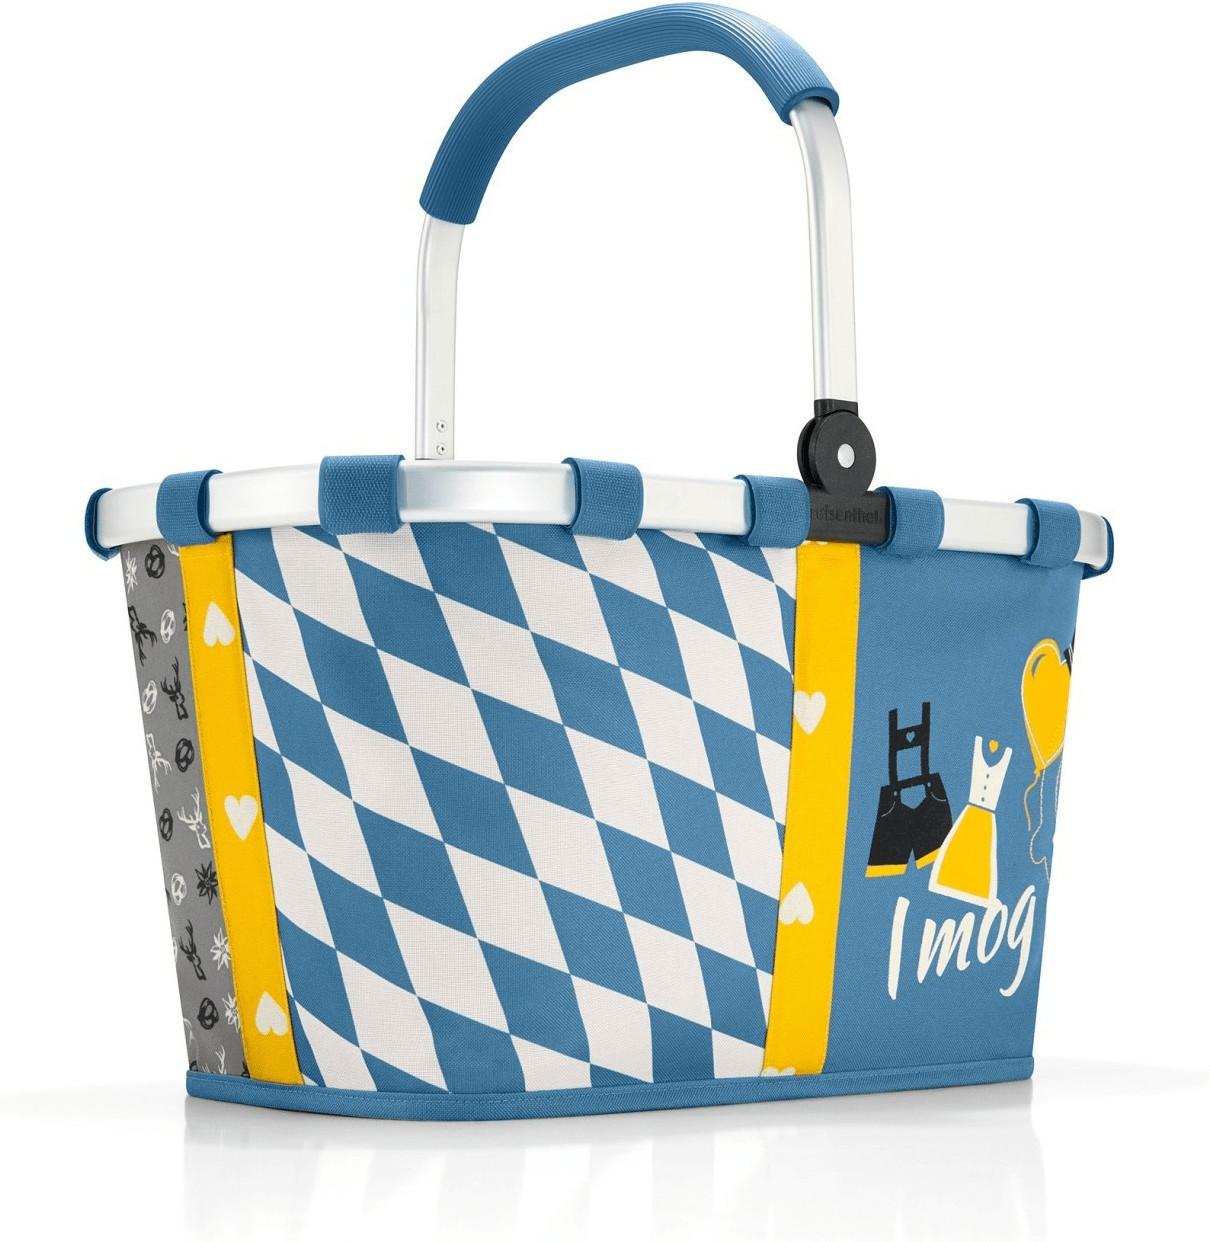 Reisenthel Carrybag special edition bavaria 2